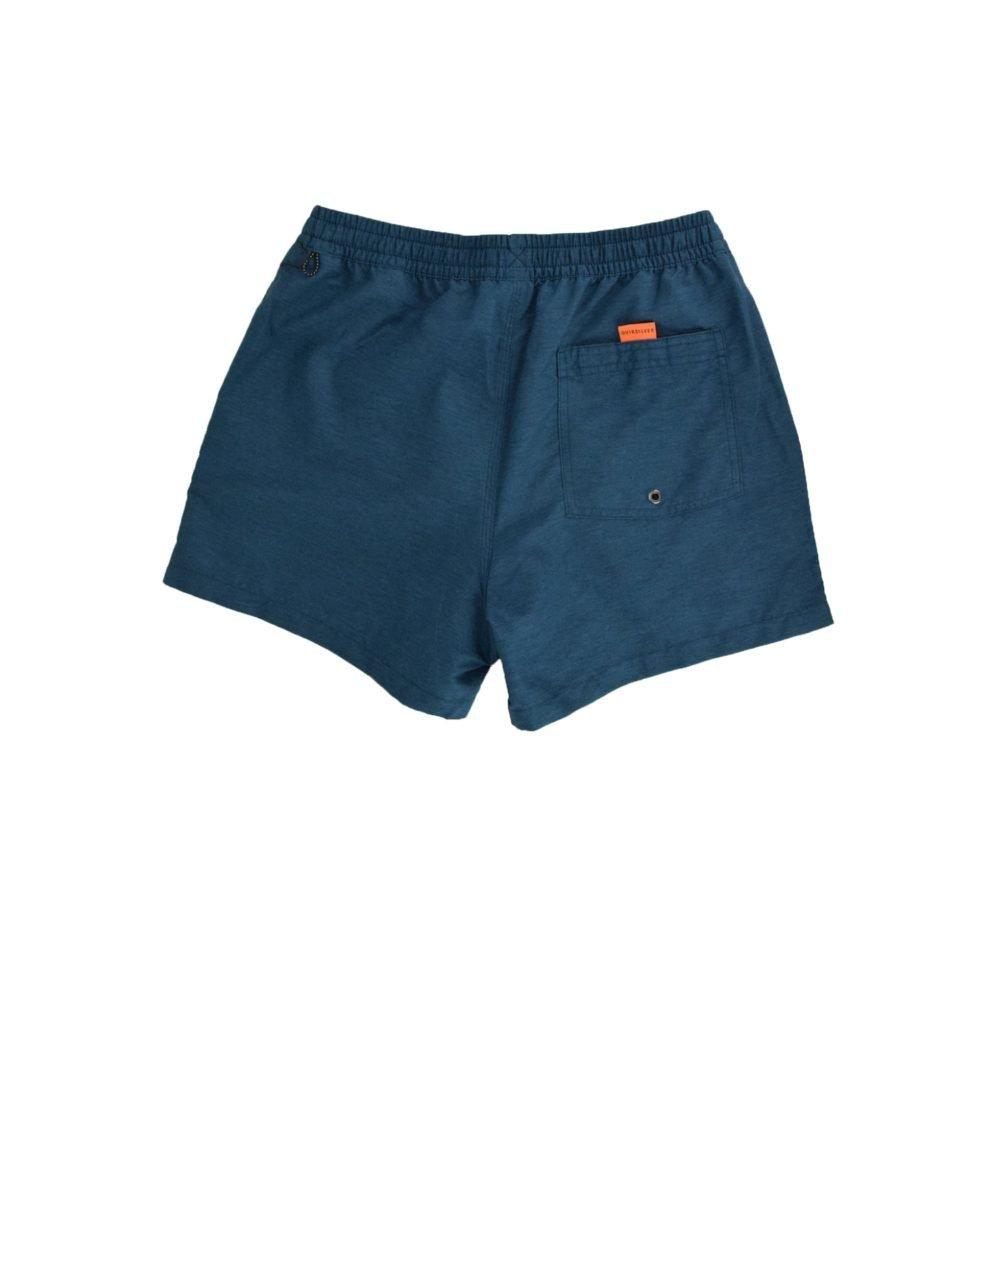 "Quiksilver Everyday 15"" - Swim Shorts (EQYJV03531-BSMH) Majolica Blue Heather"